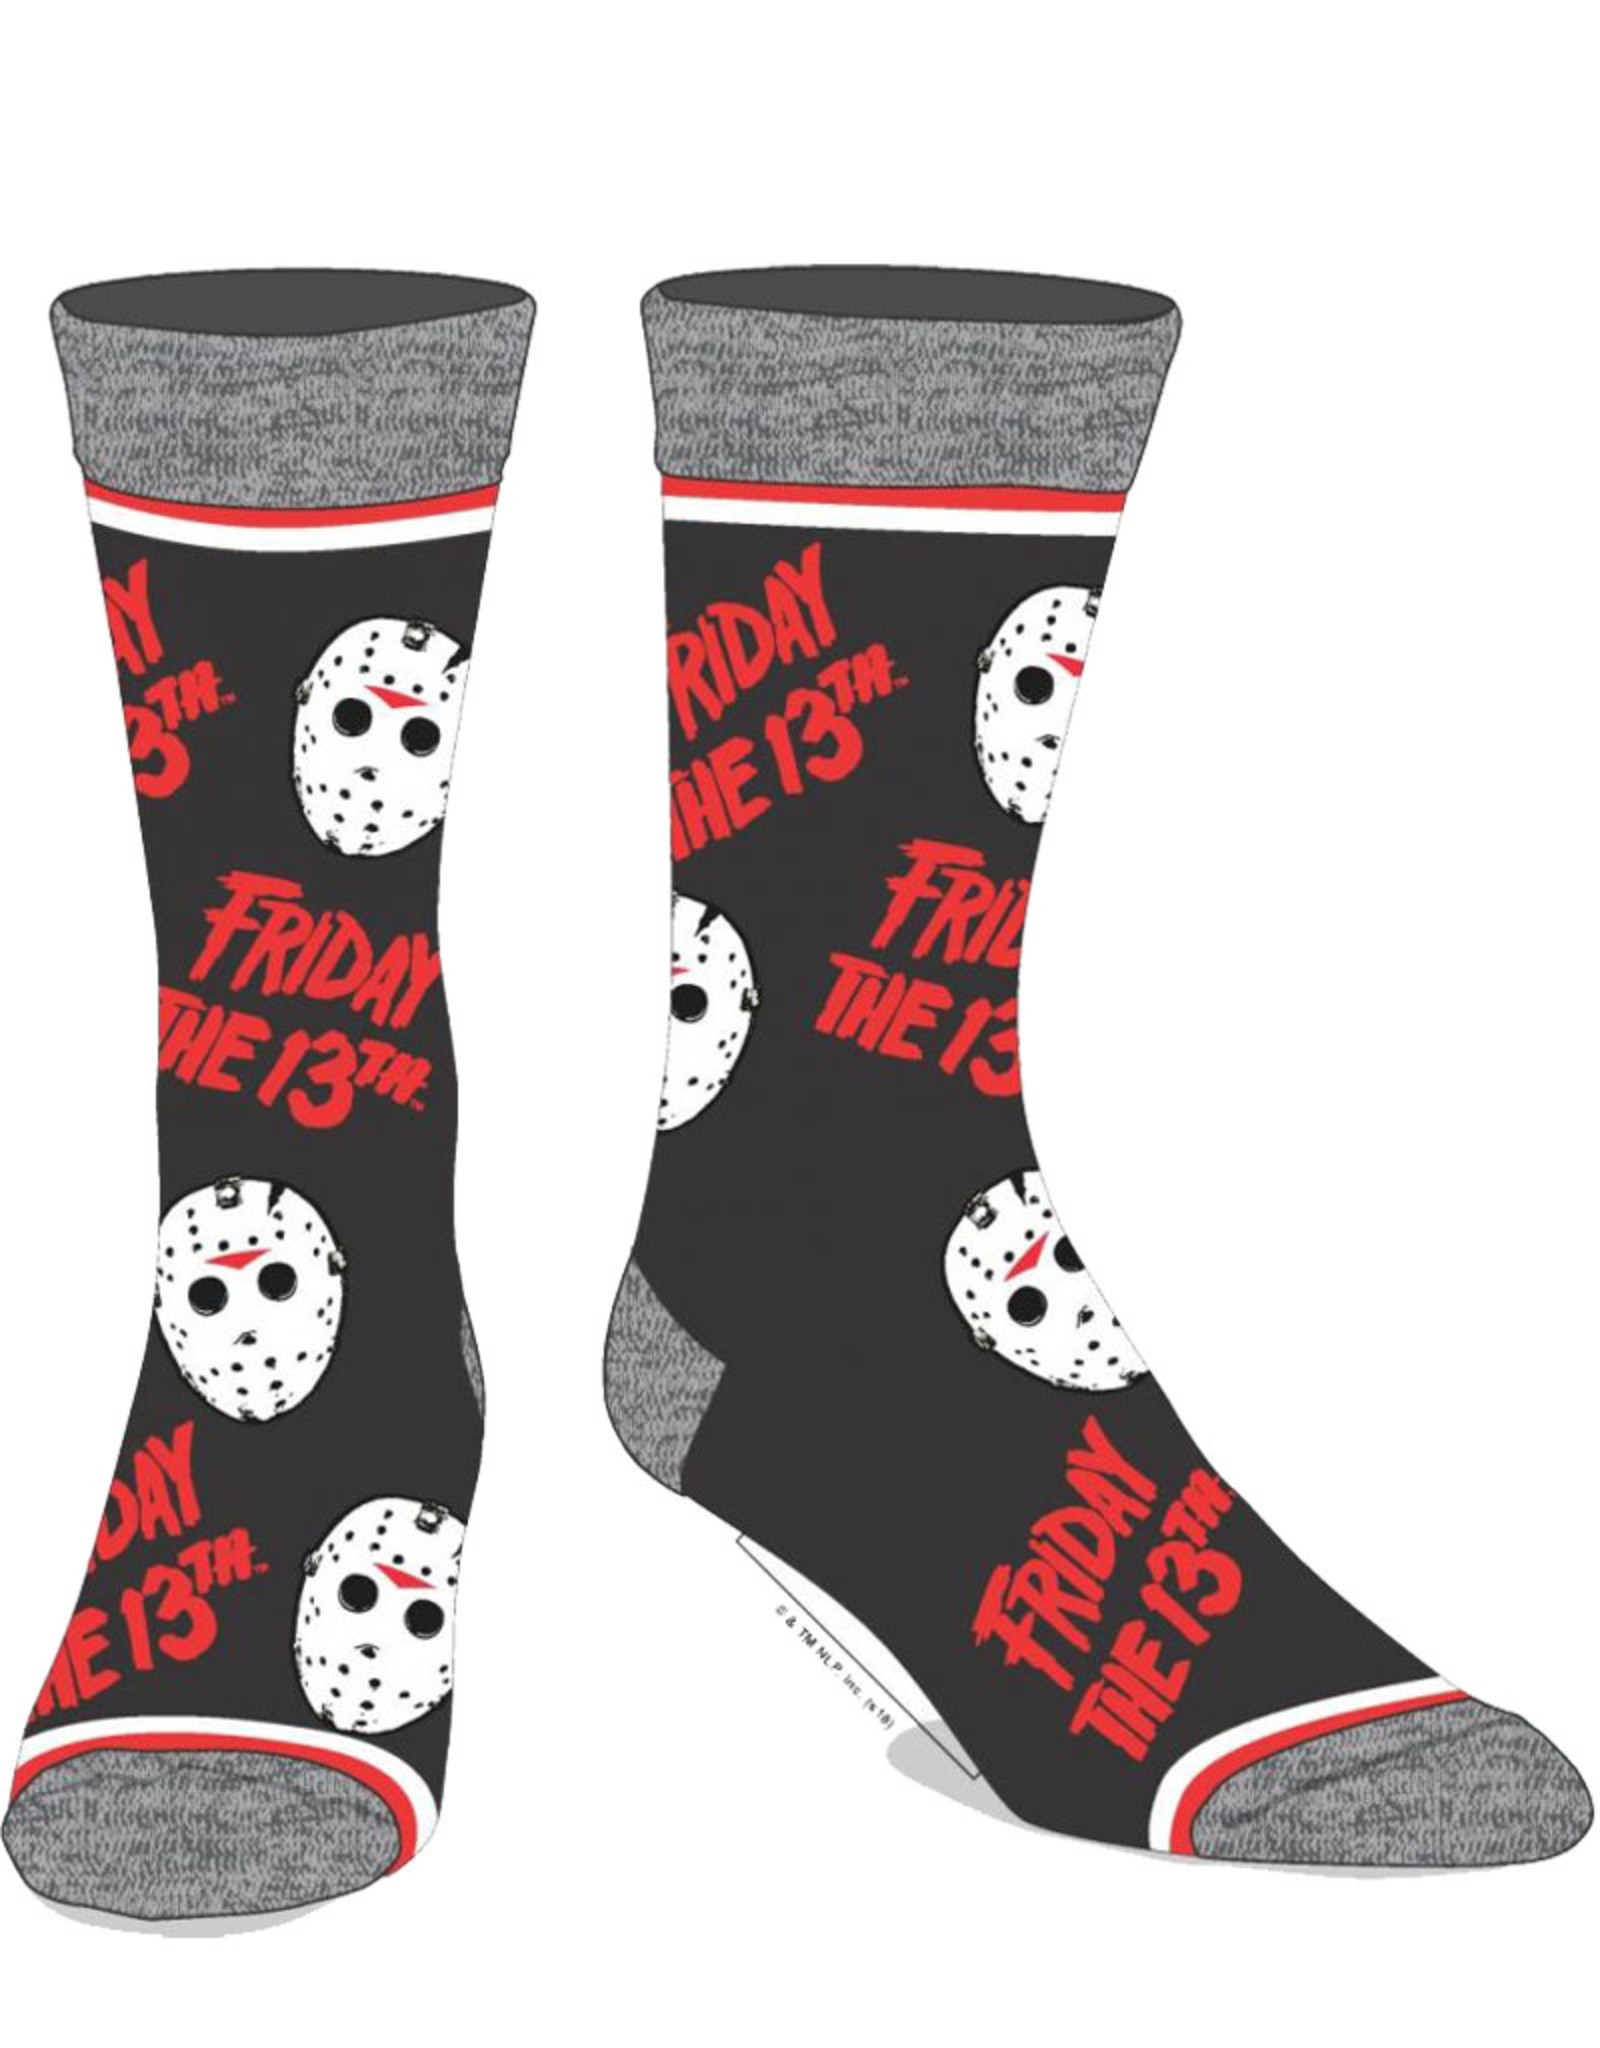 Friday The 13th ( Socks )